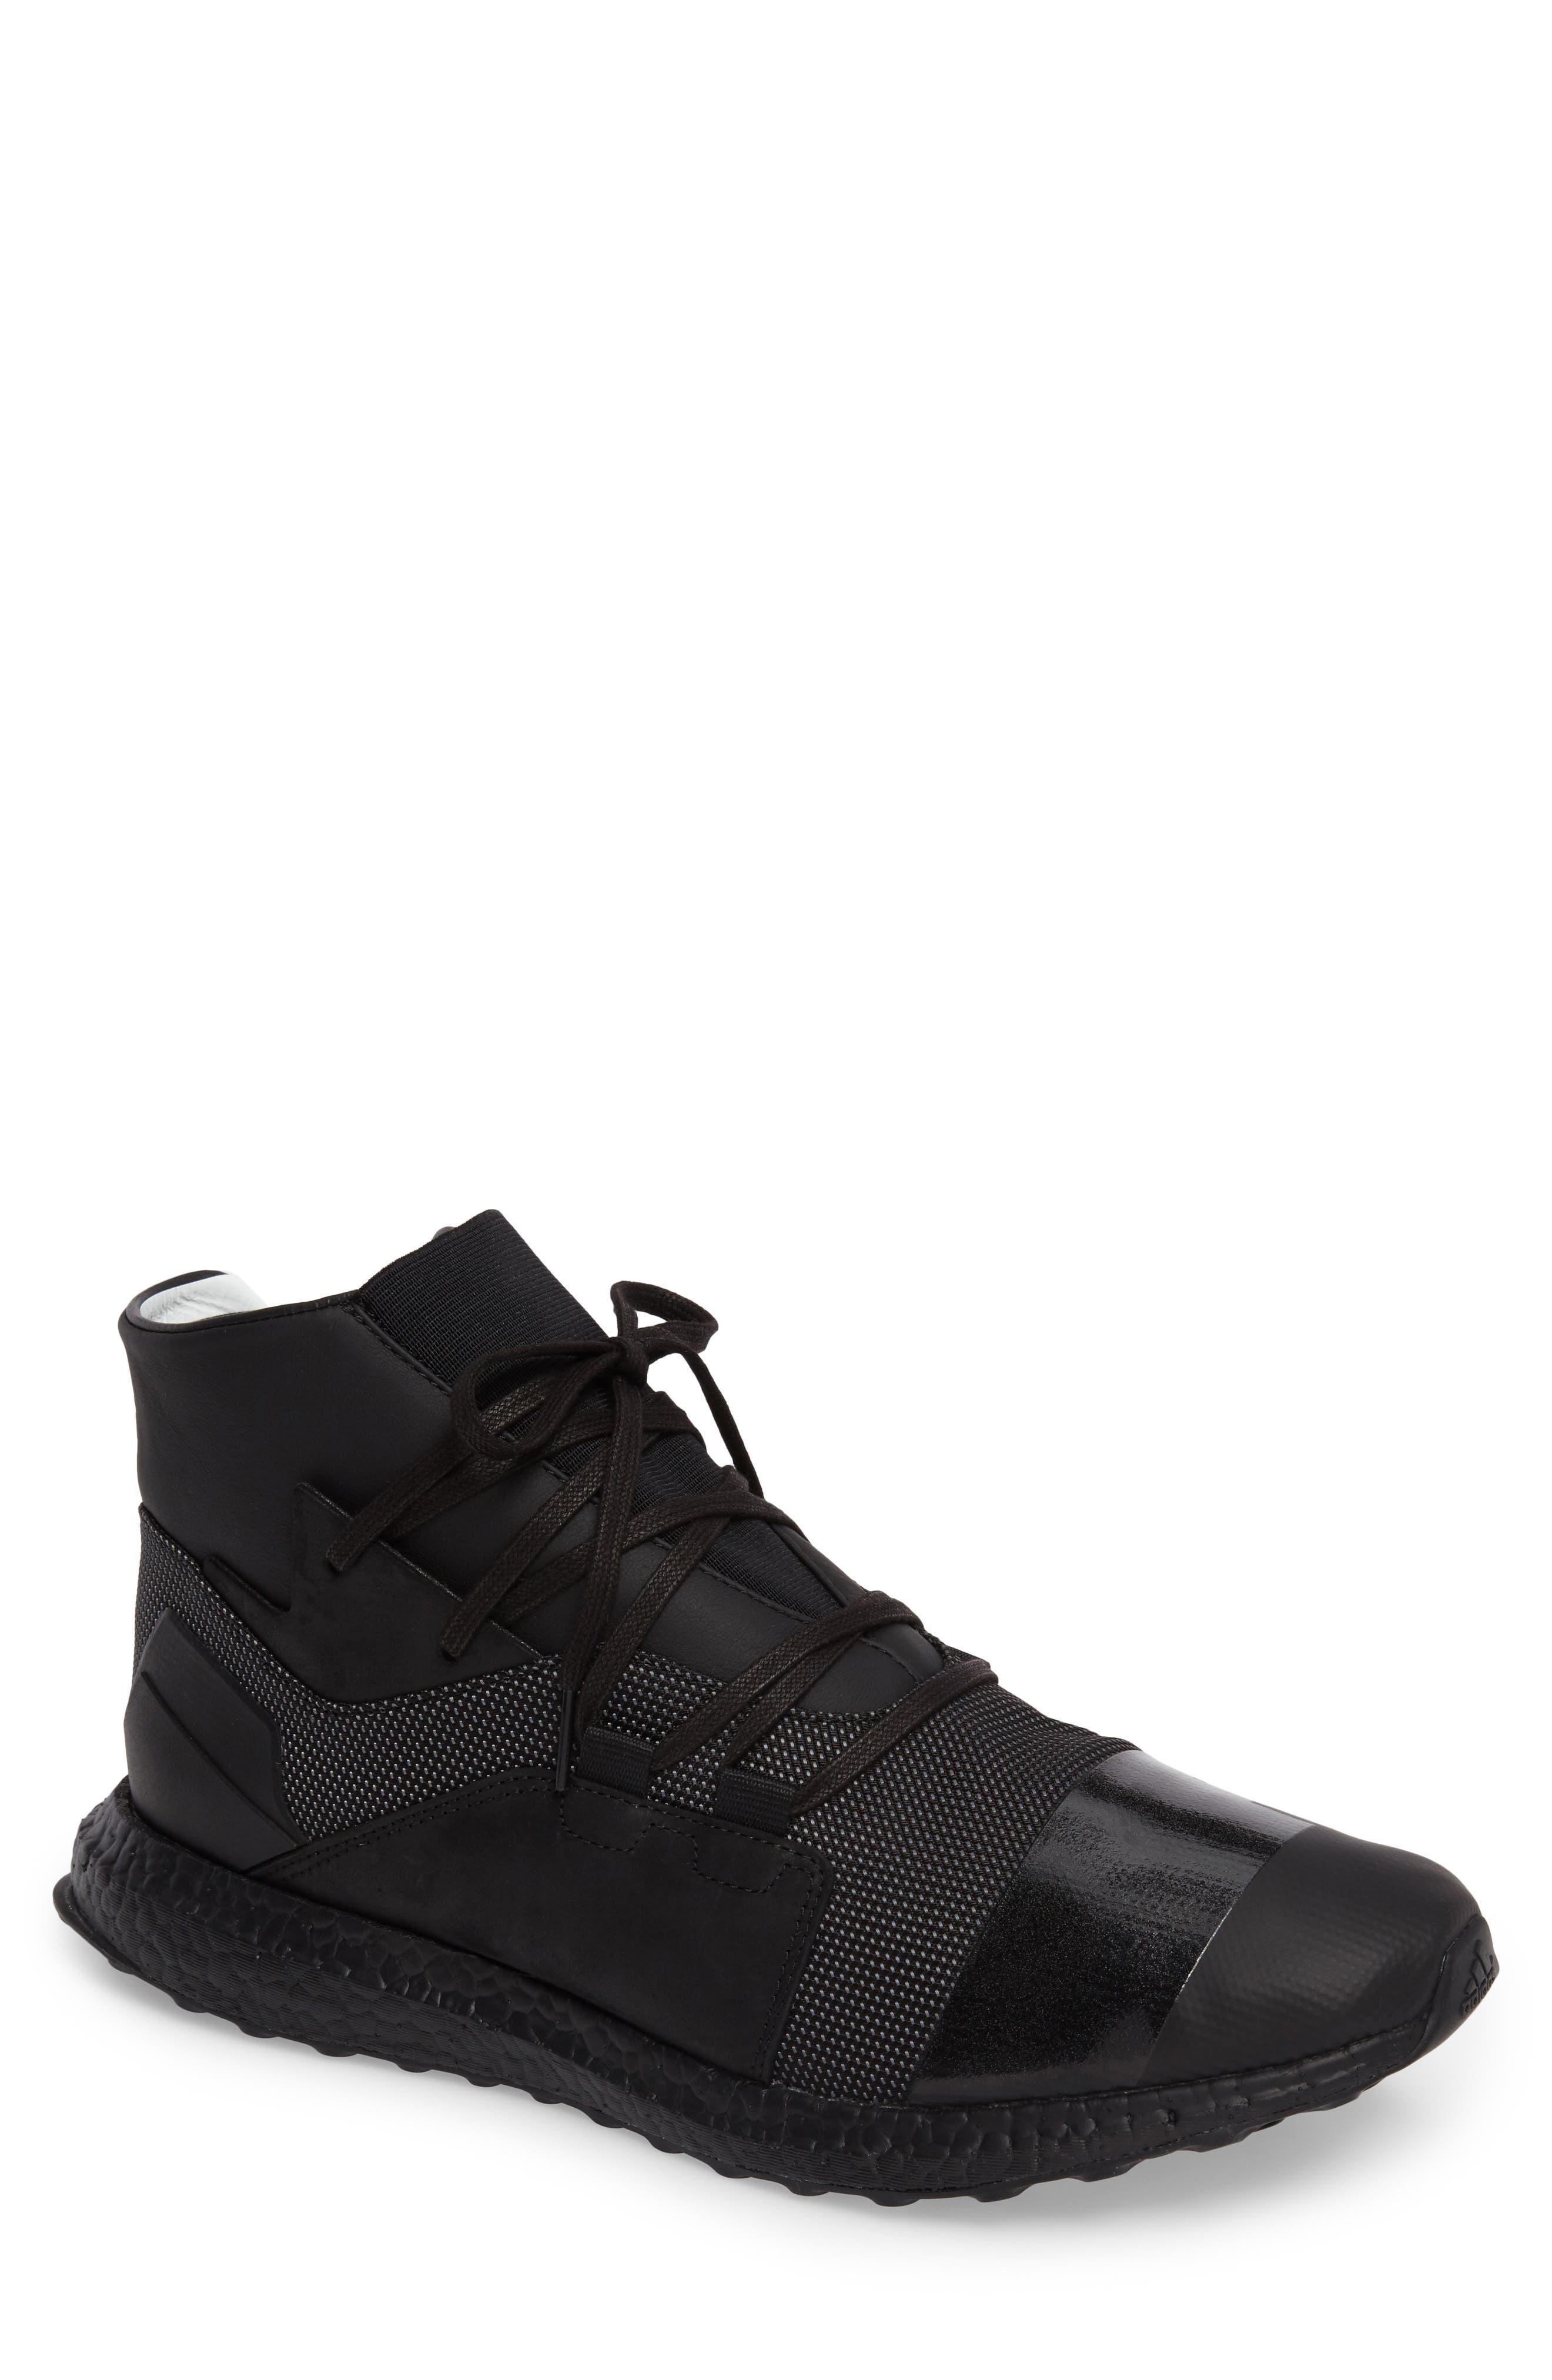 Kozoko High Sneaker,                             Main thumbnail 1, color,                             Black